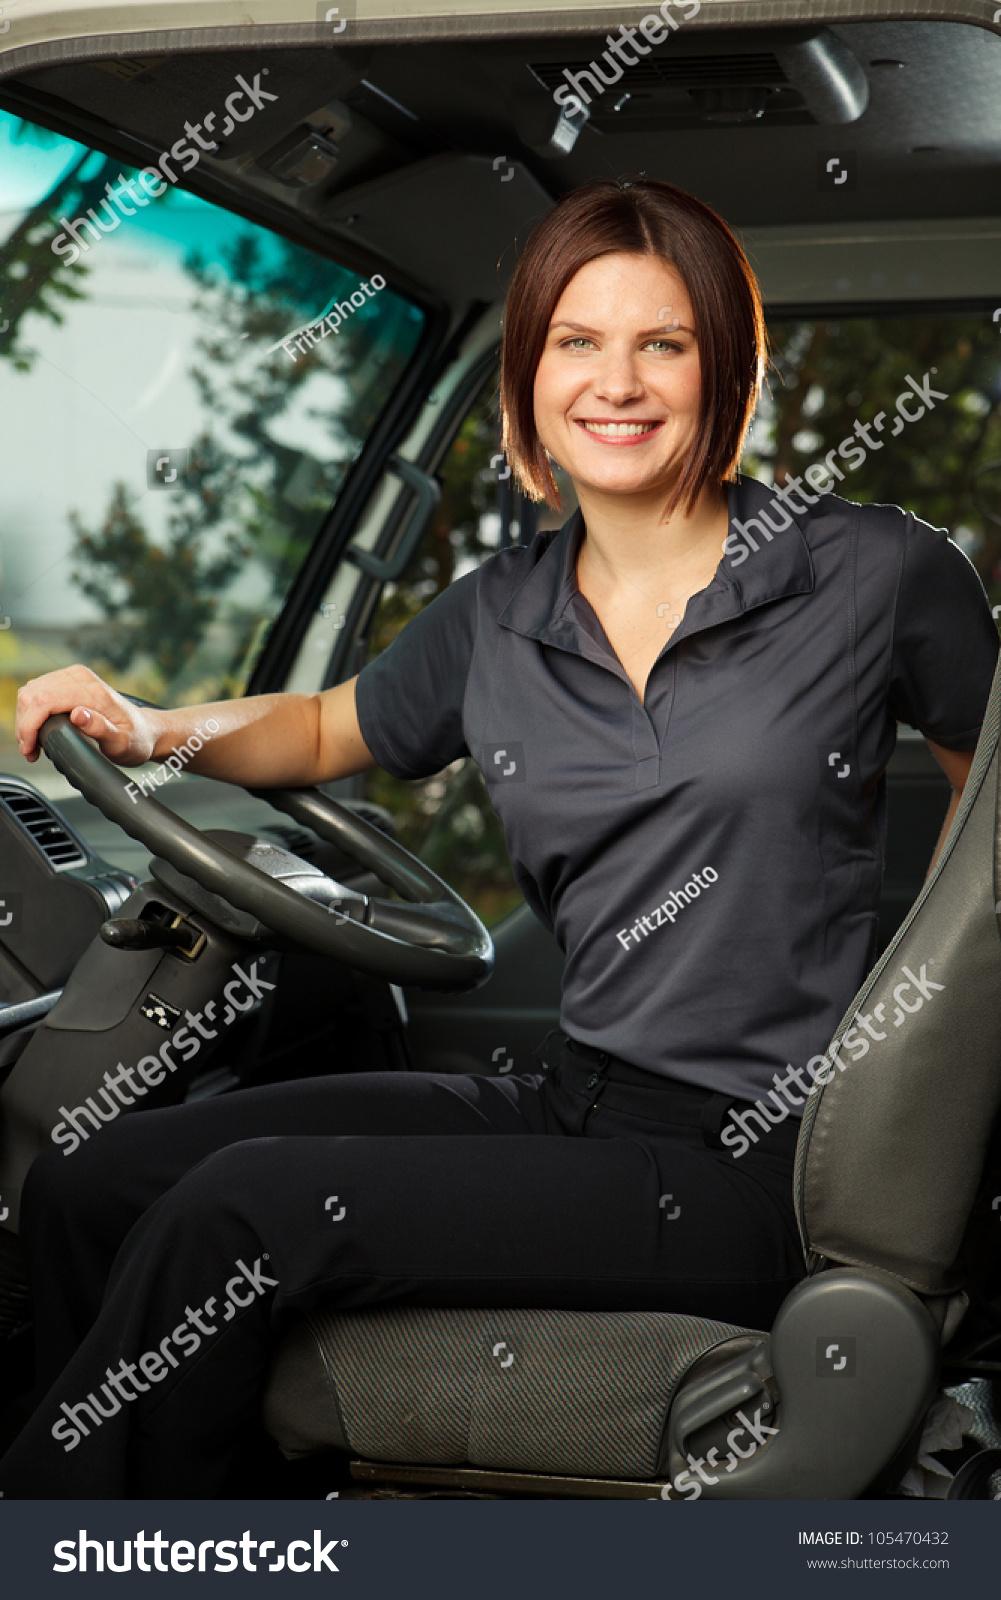 delivery driver uniforms - photo #34